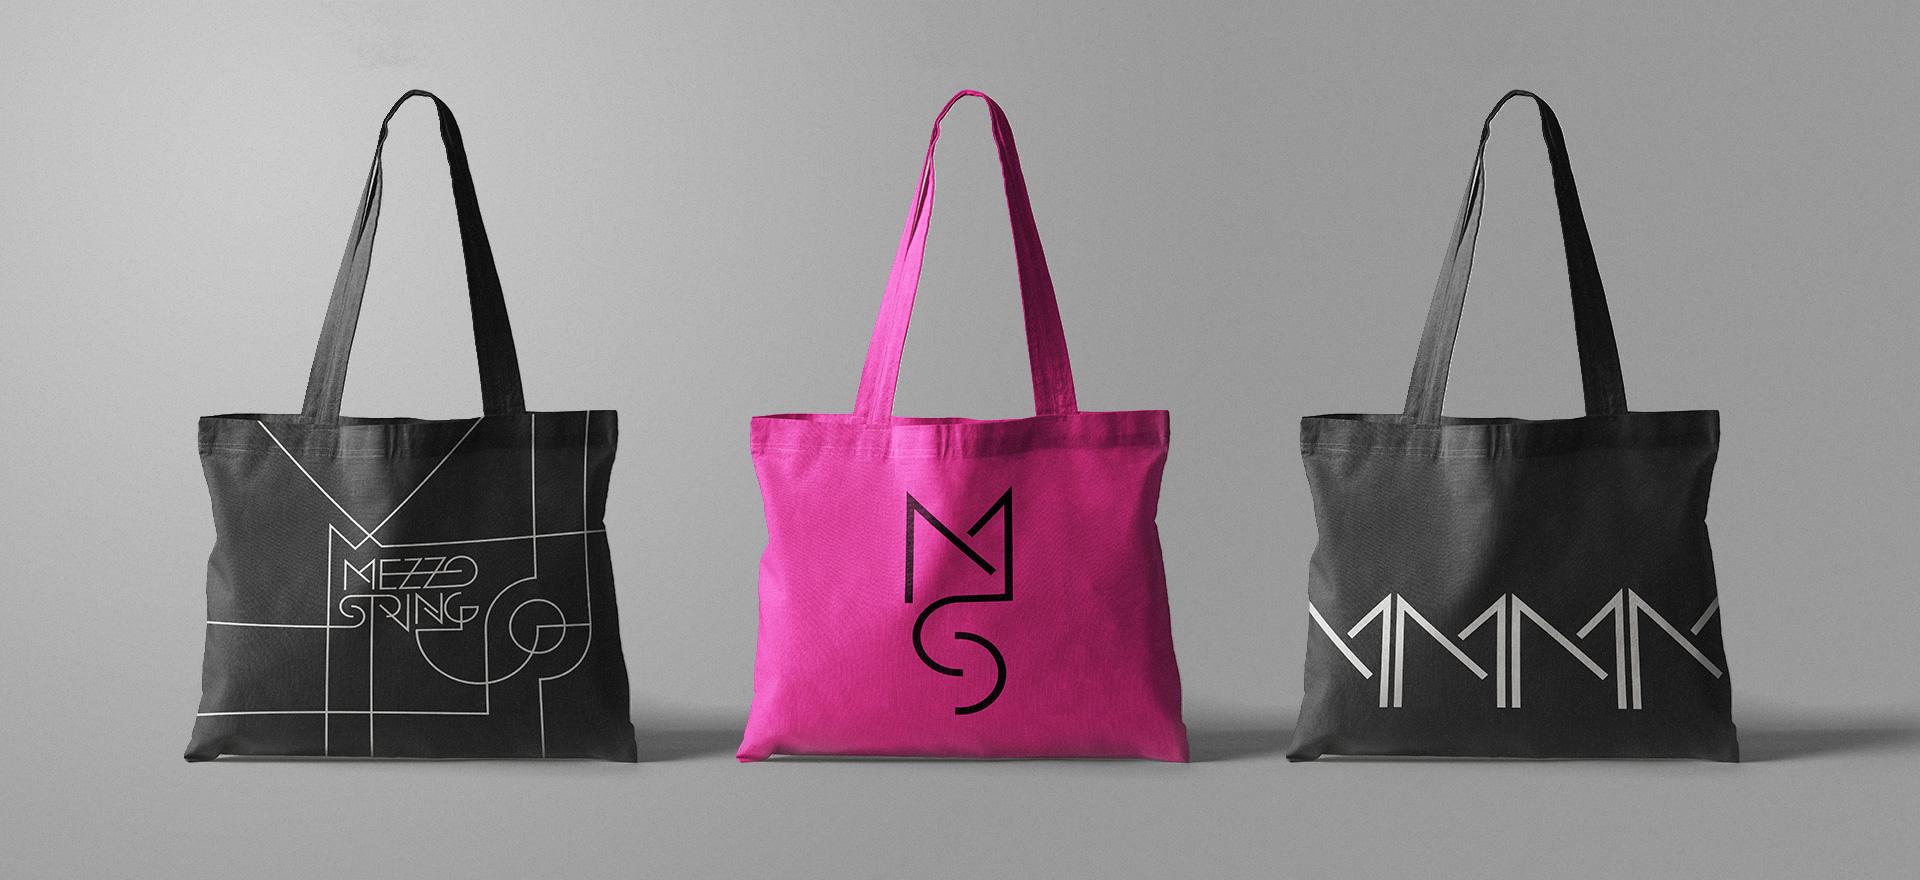 Mezzo String Logo & Identity Design